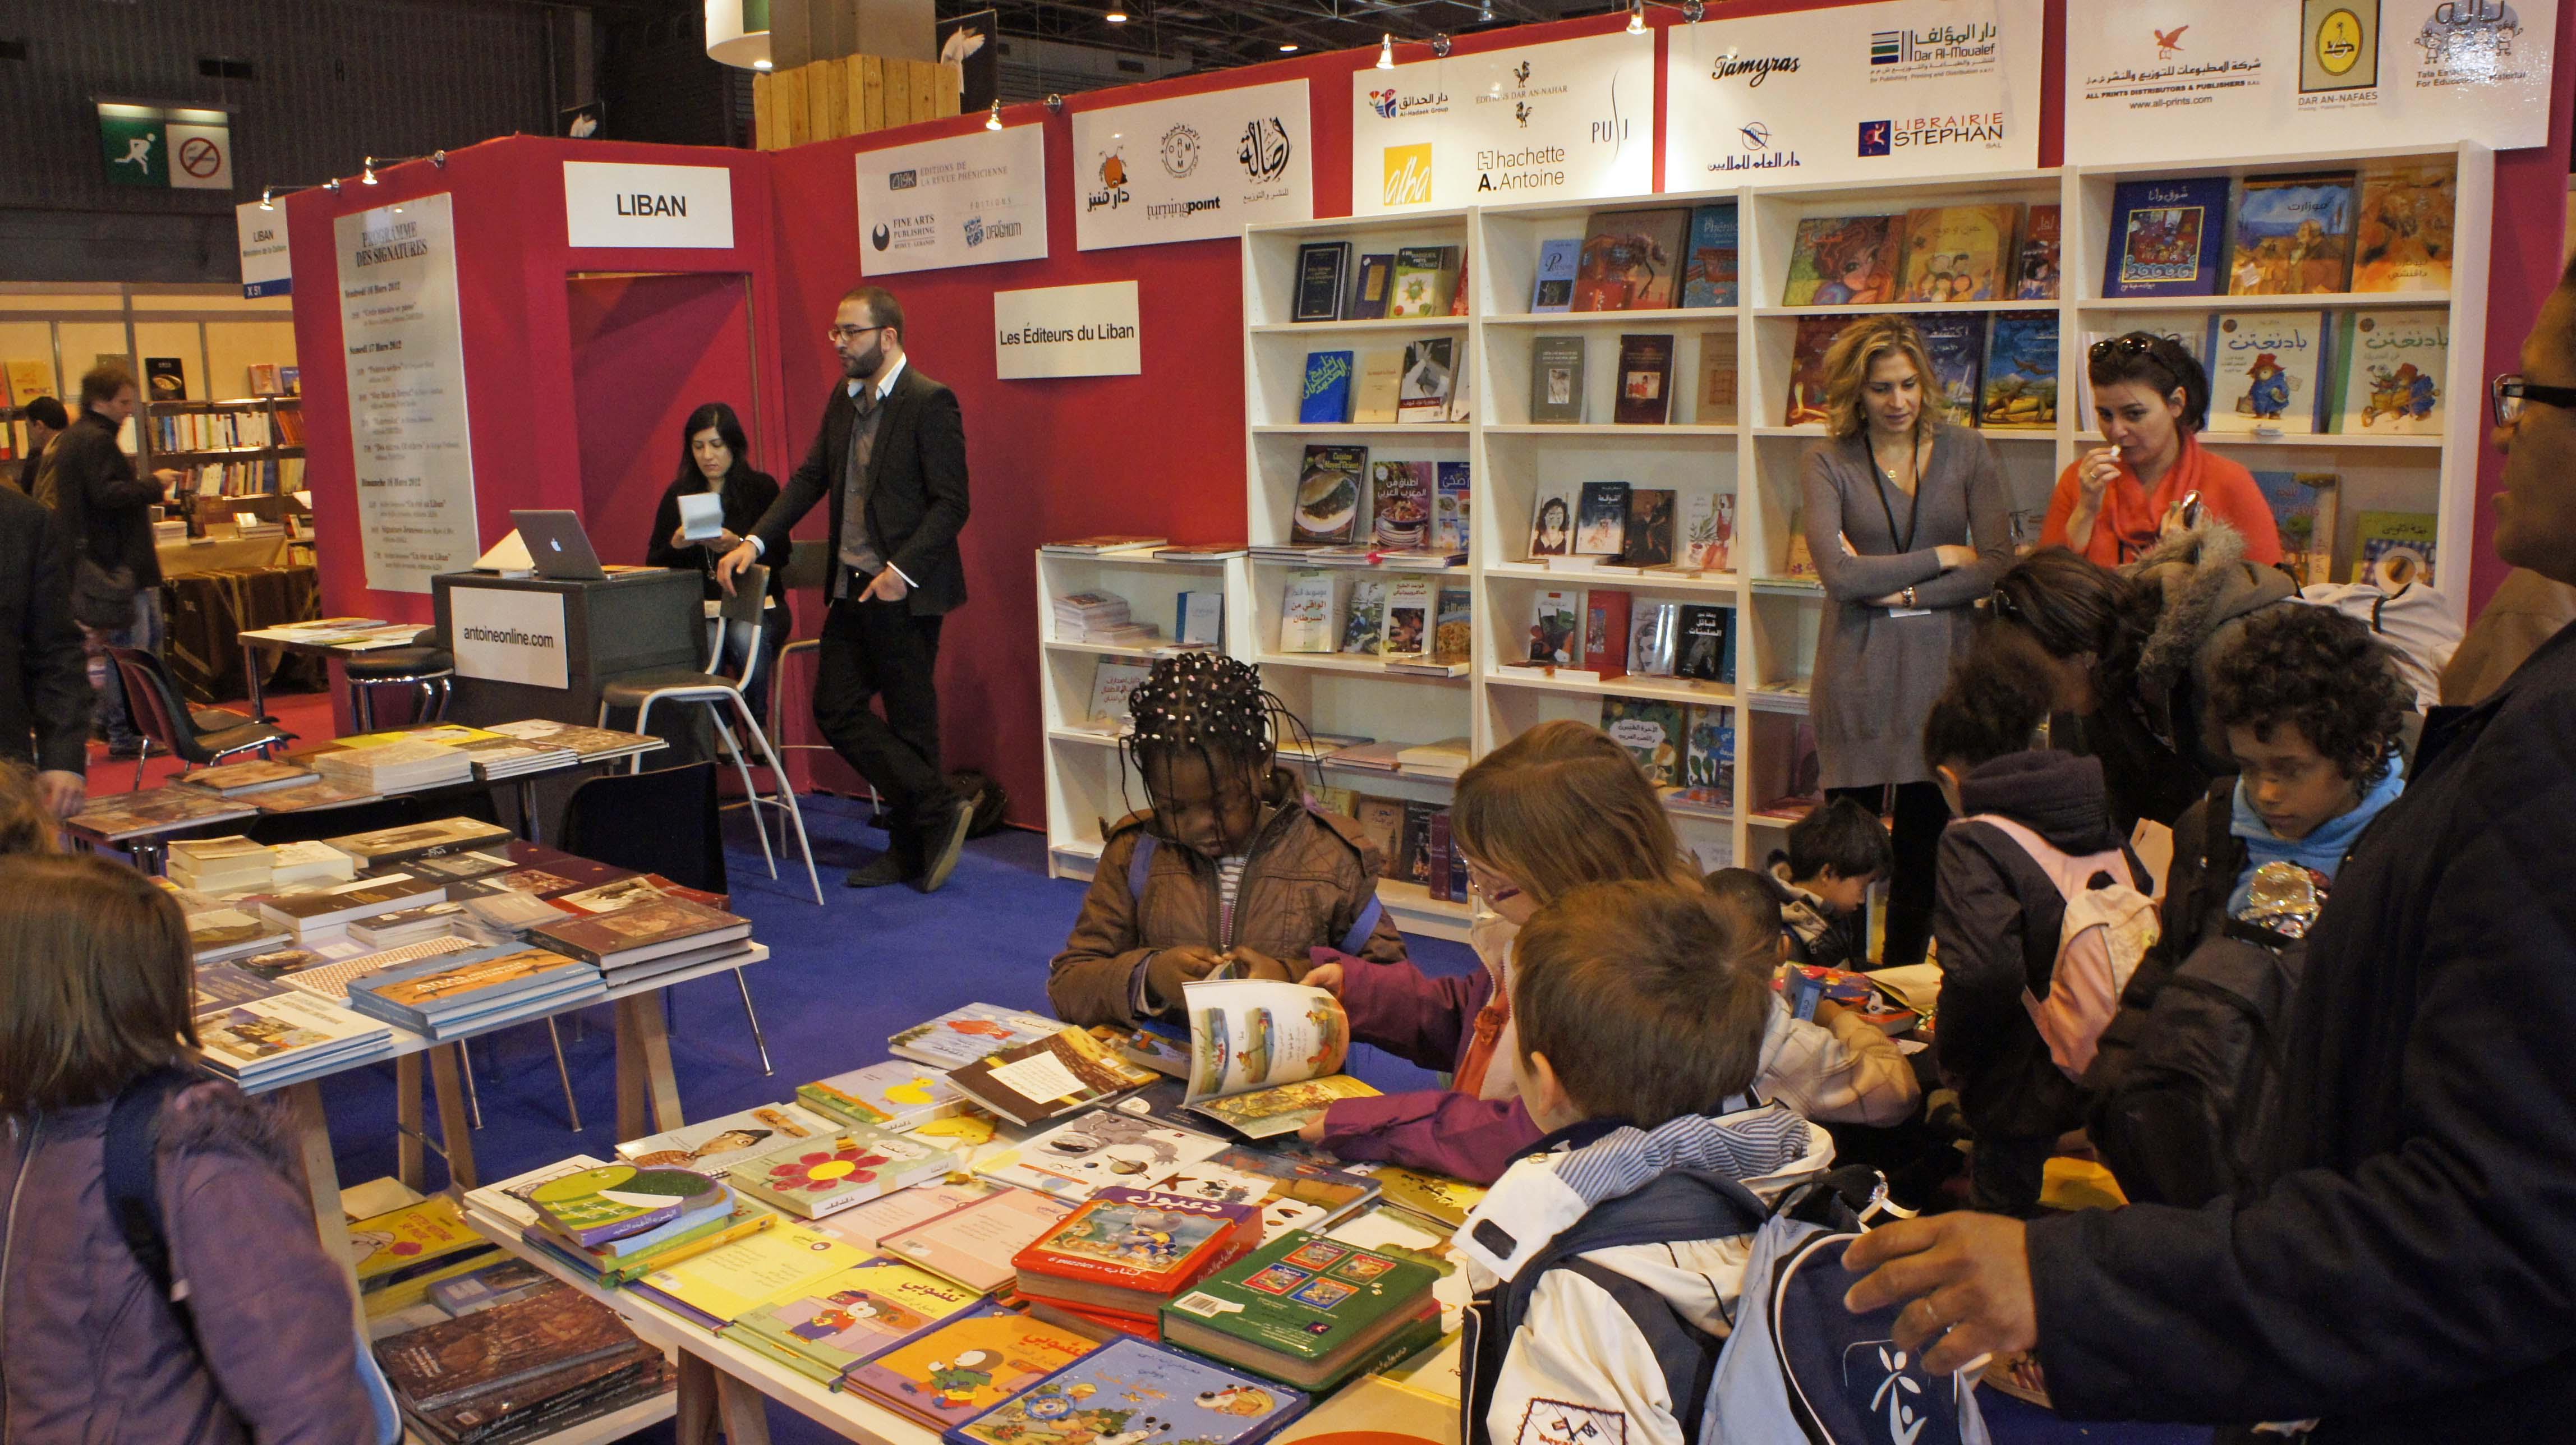 File liban salon du livre wikimedia commons - Salon du livre anarchiste ...